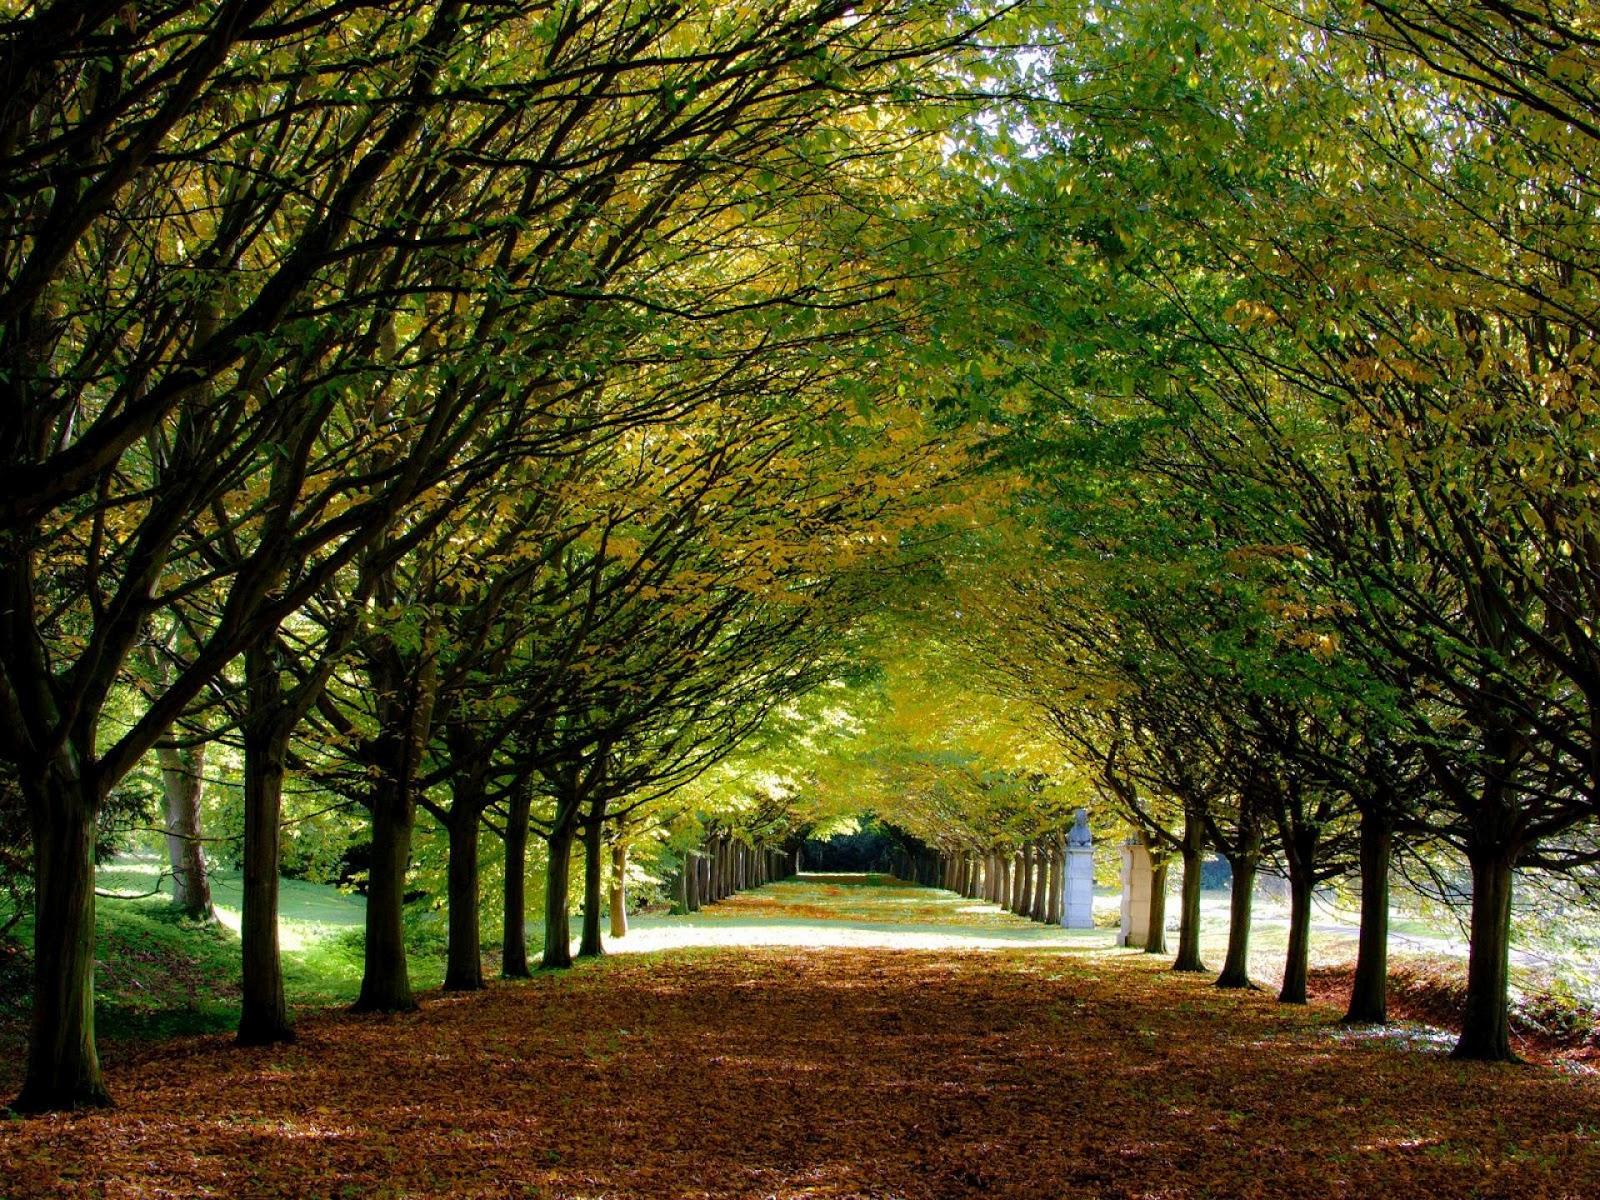 Autumn anglesey abbey cambridgeshire england landscape